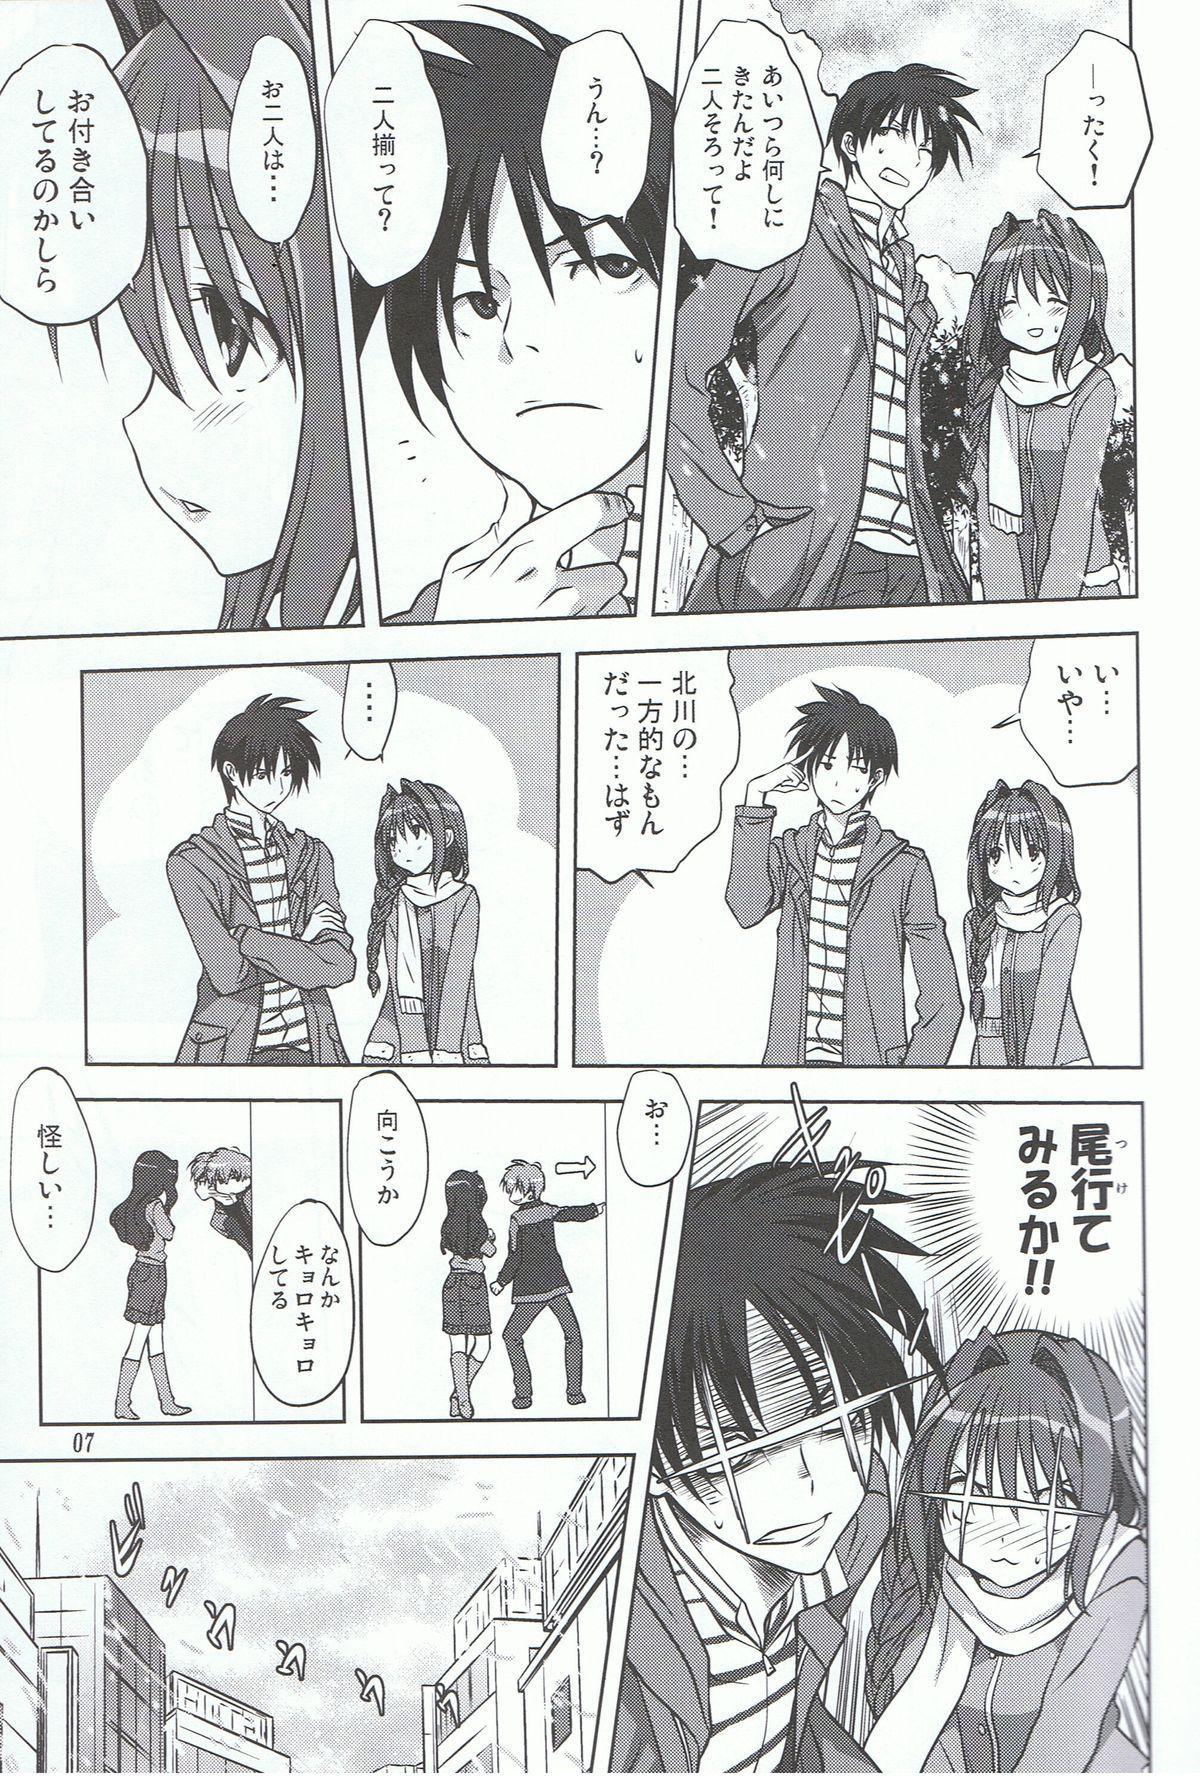 Akiko-san to Issho 13 5